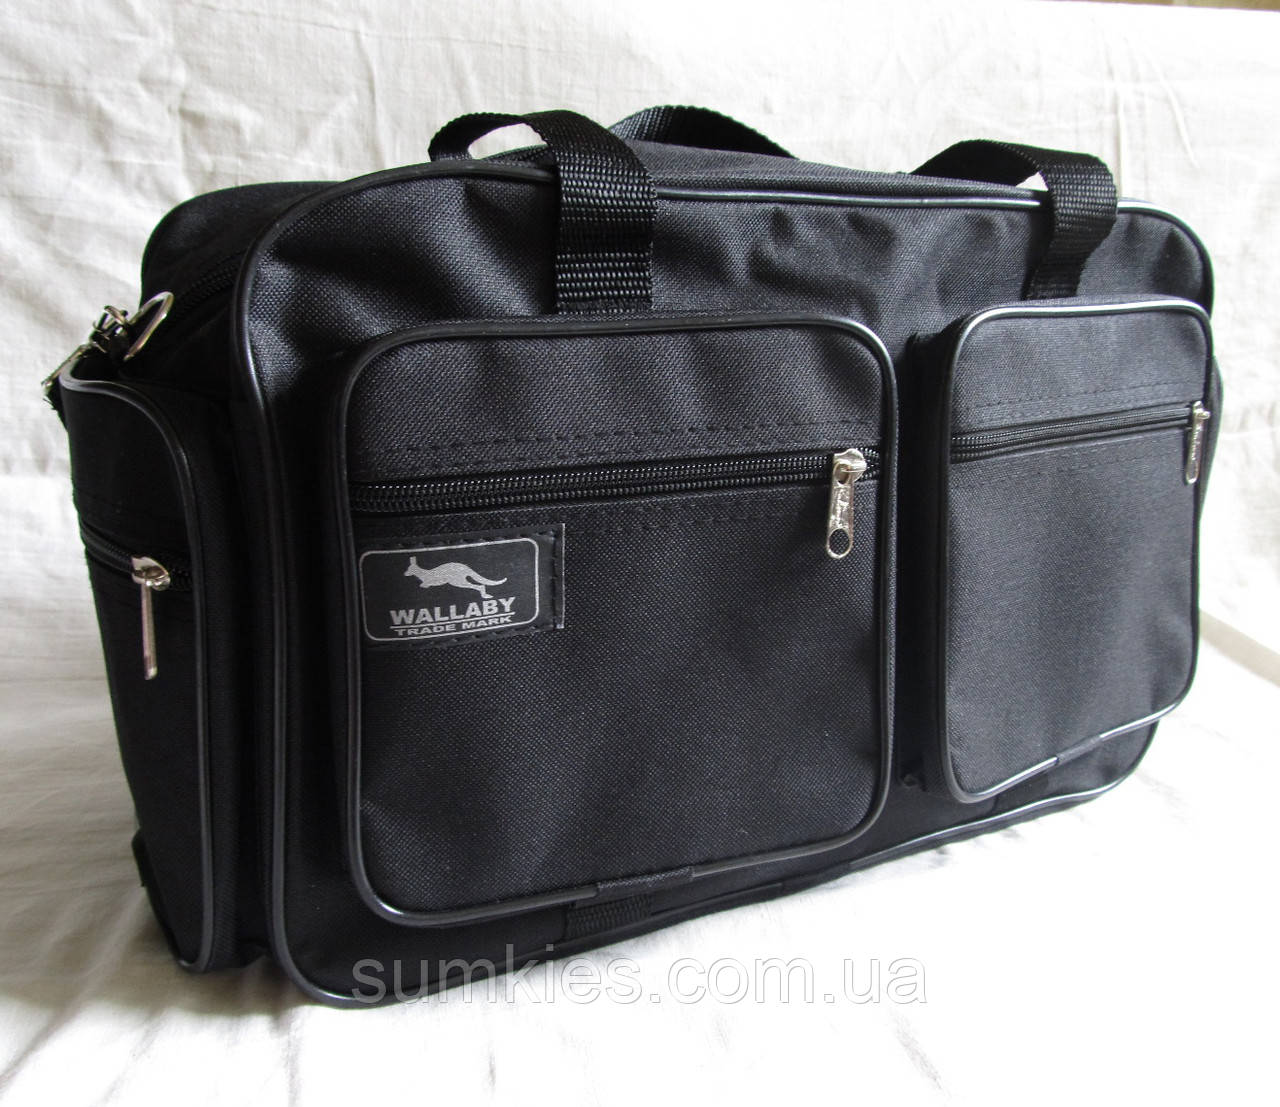 3b2e94f00048 Мужская сумка Wallaby 2760 черная барсетка через плечо портфель А4+  38x24x16см